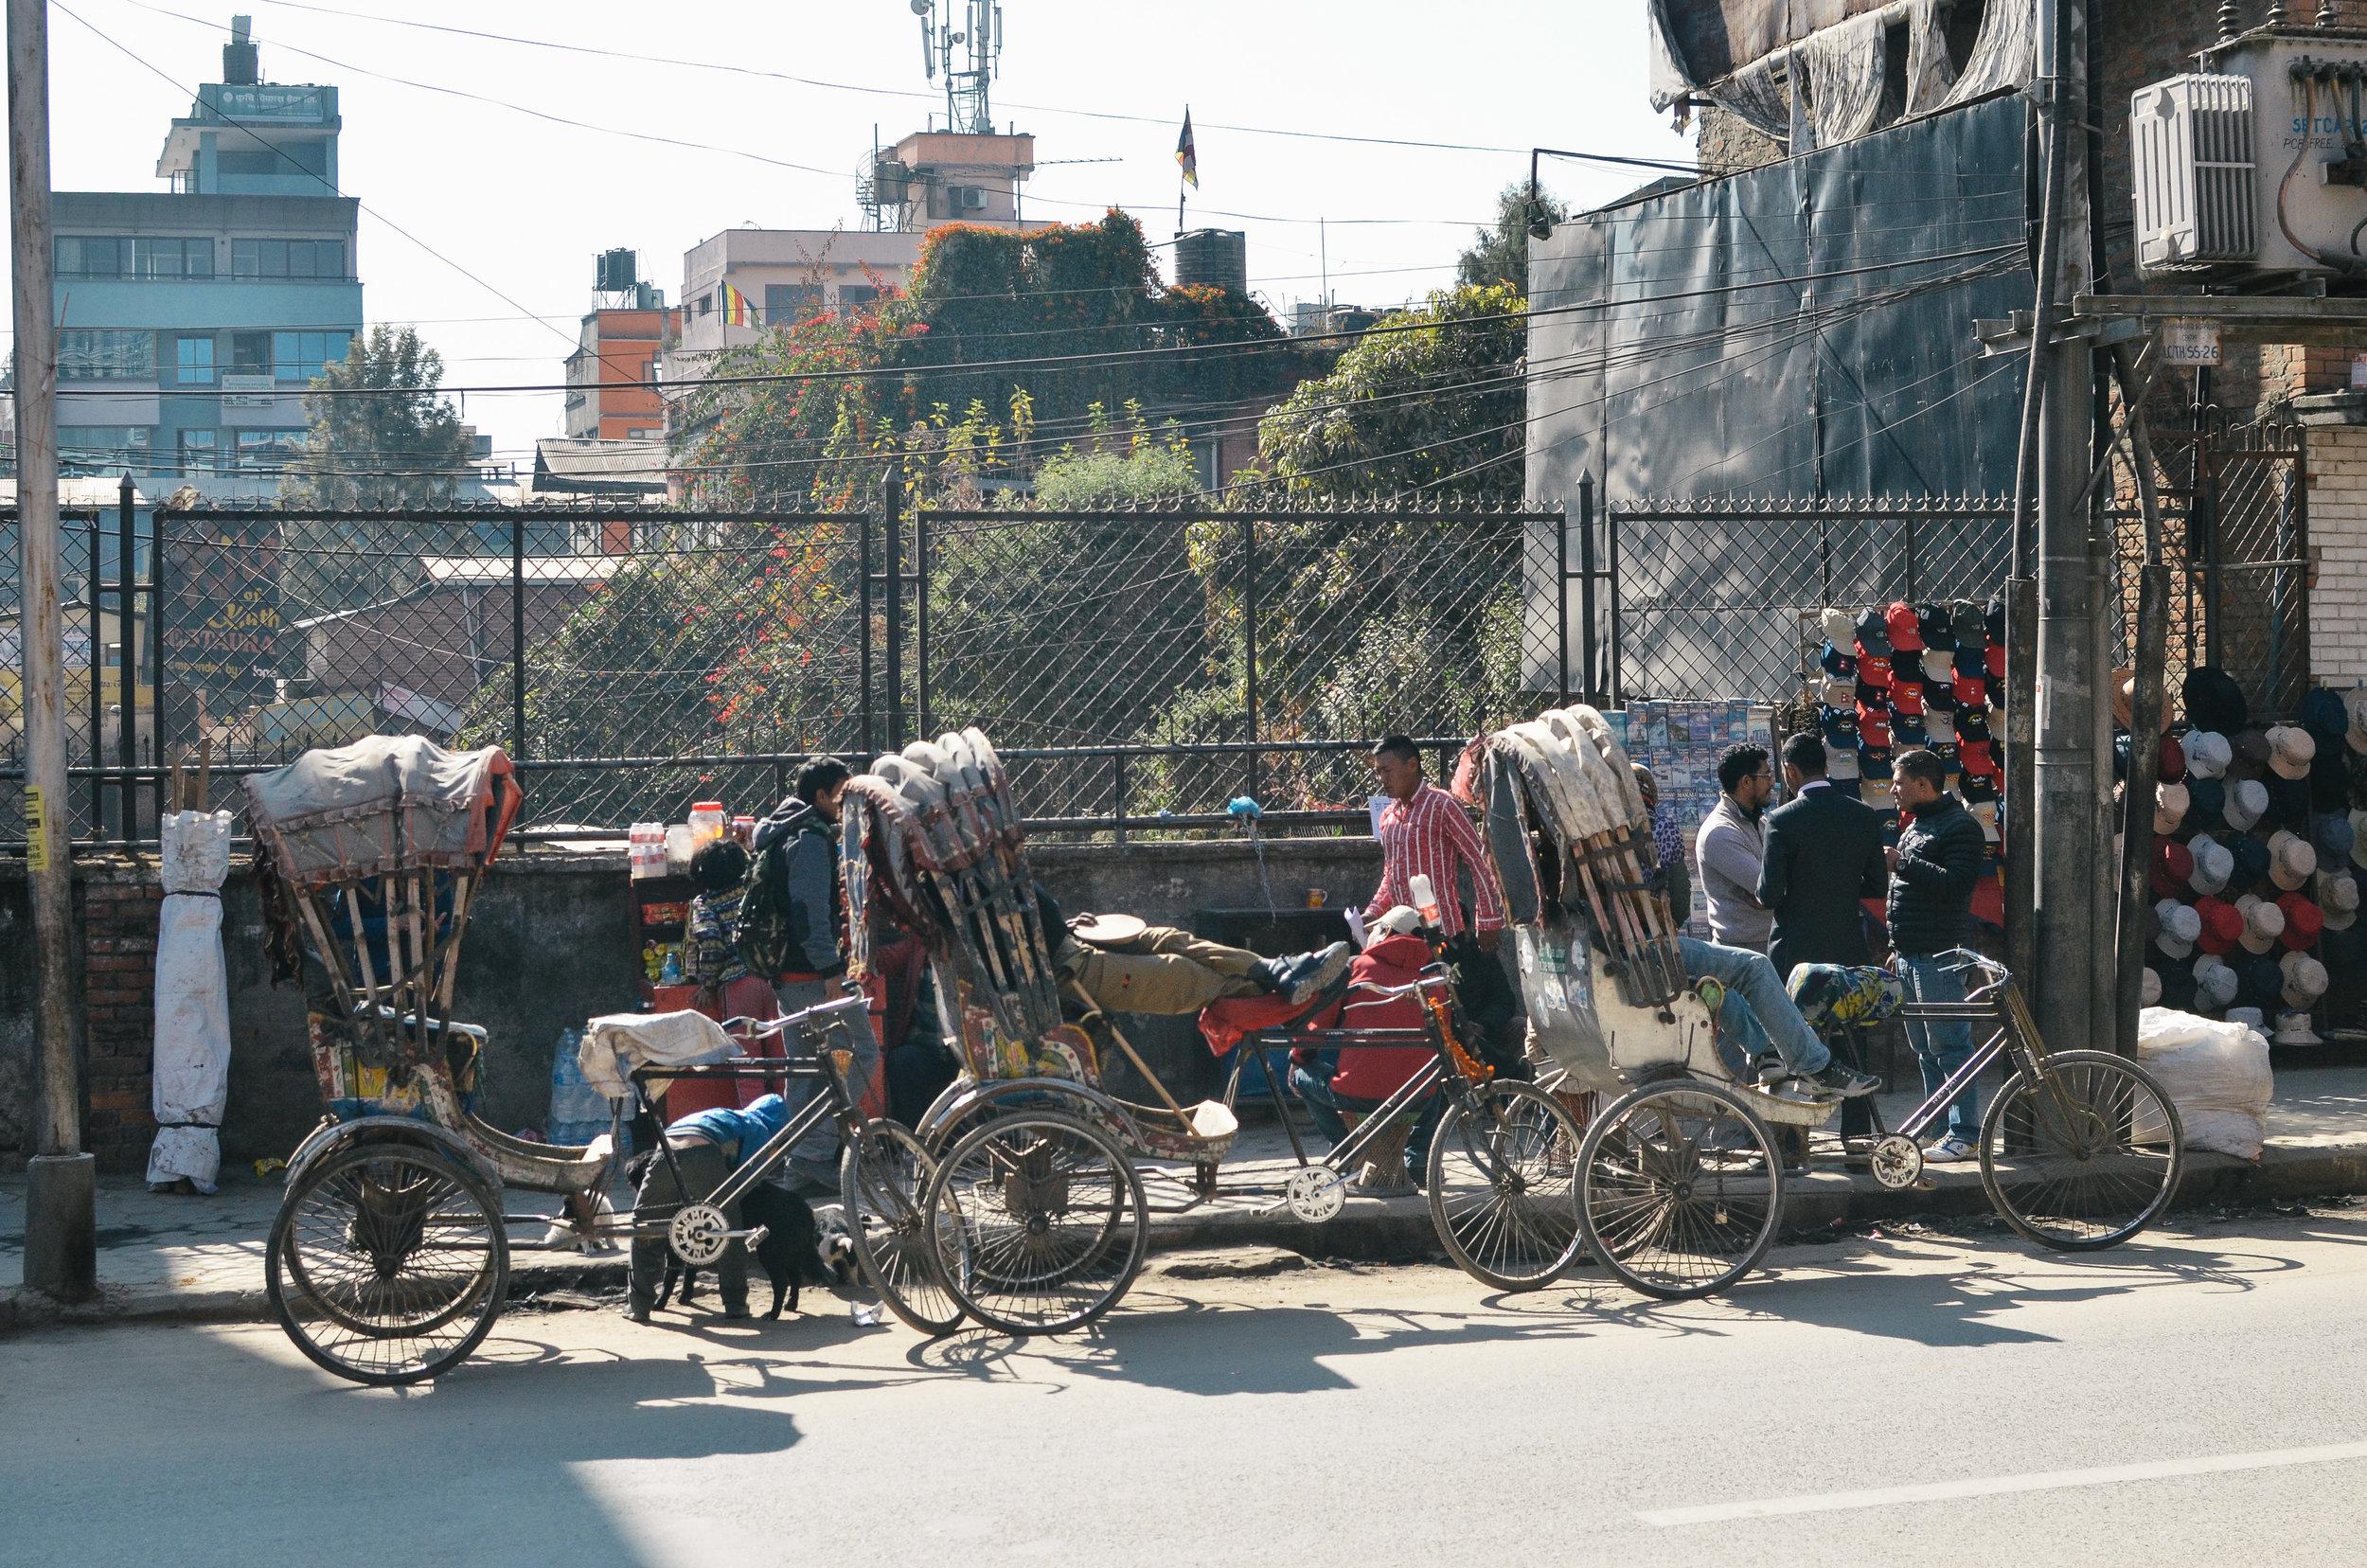 10-things-to-know-kathmandu-nepal-lifeonpine_DSC_0528.jpg